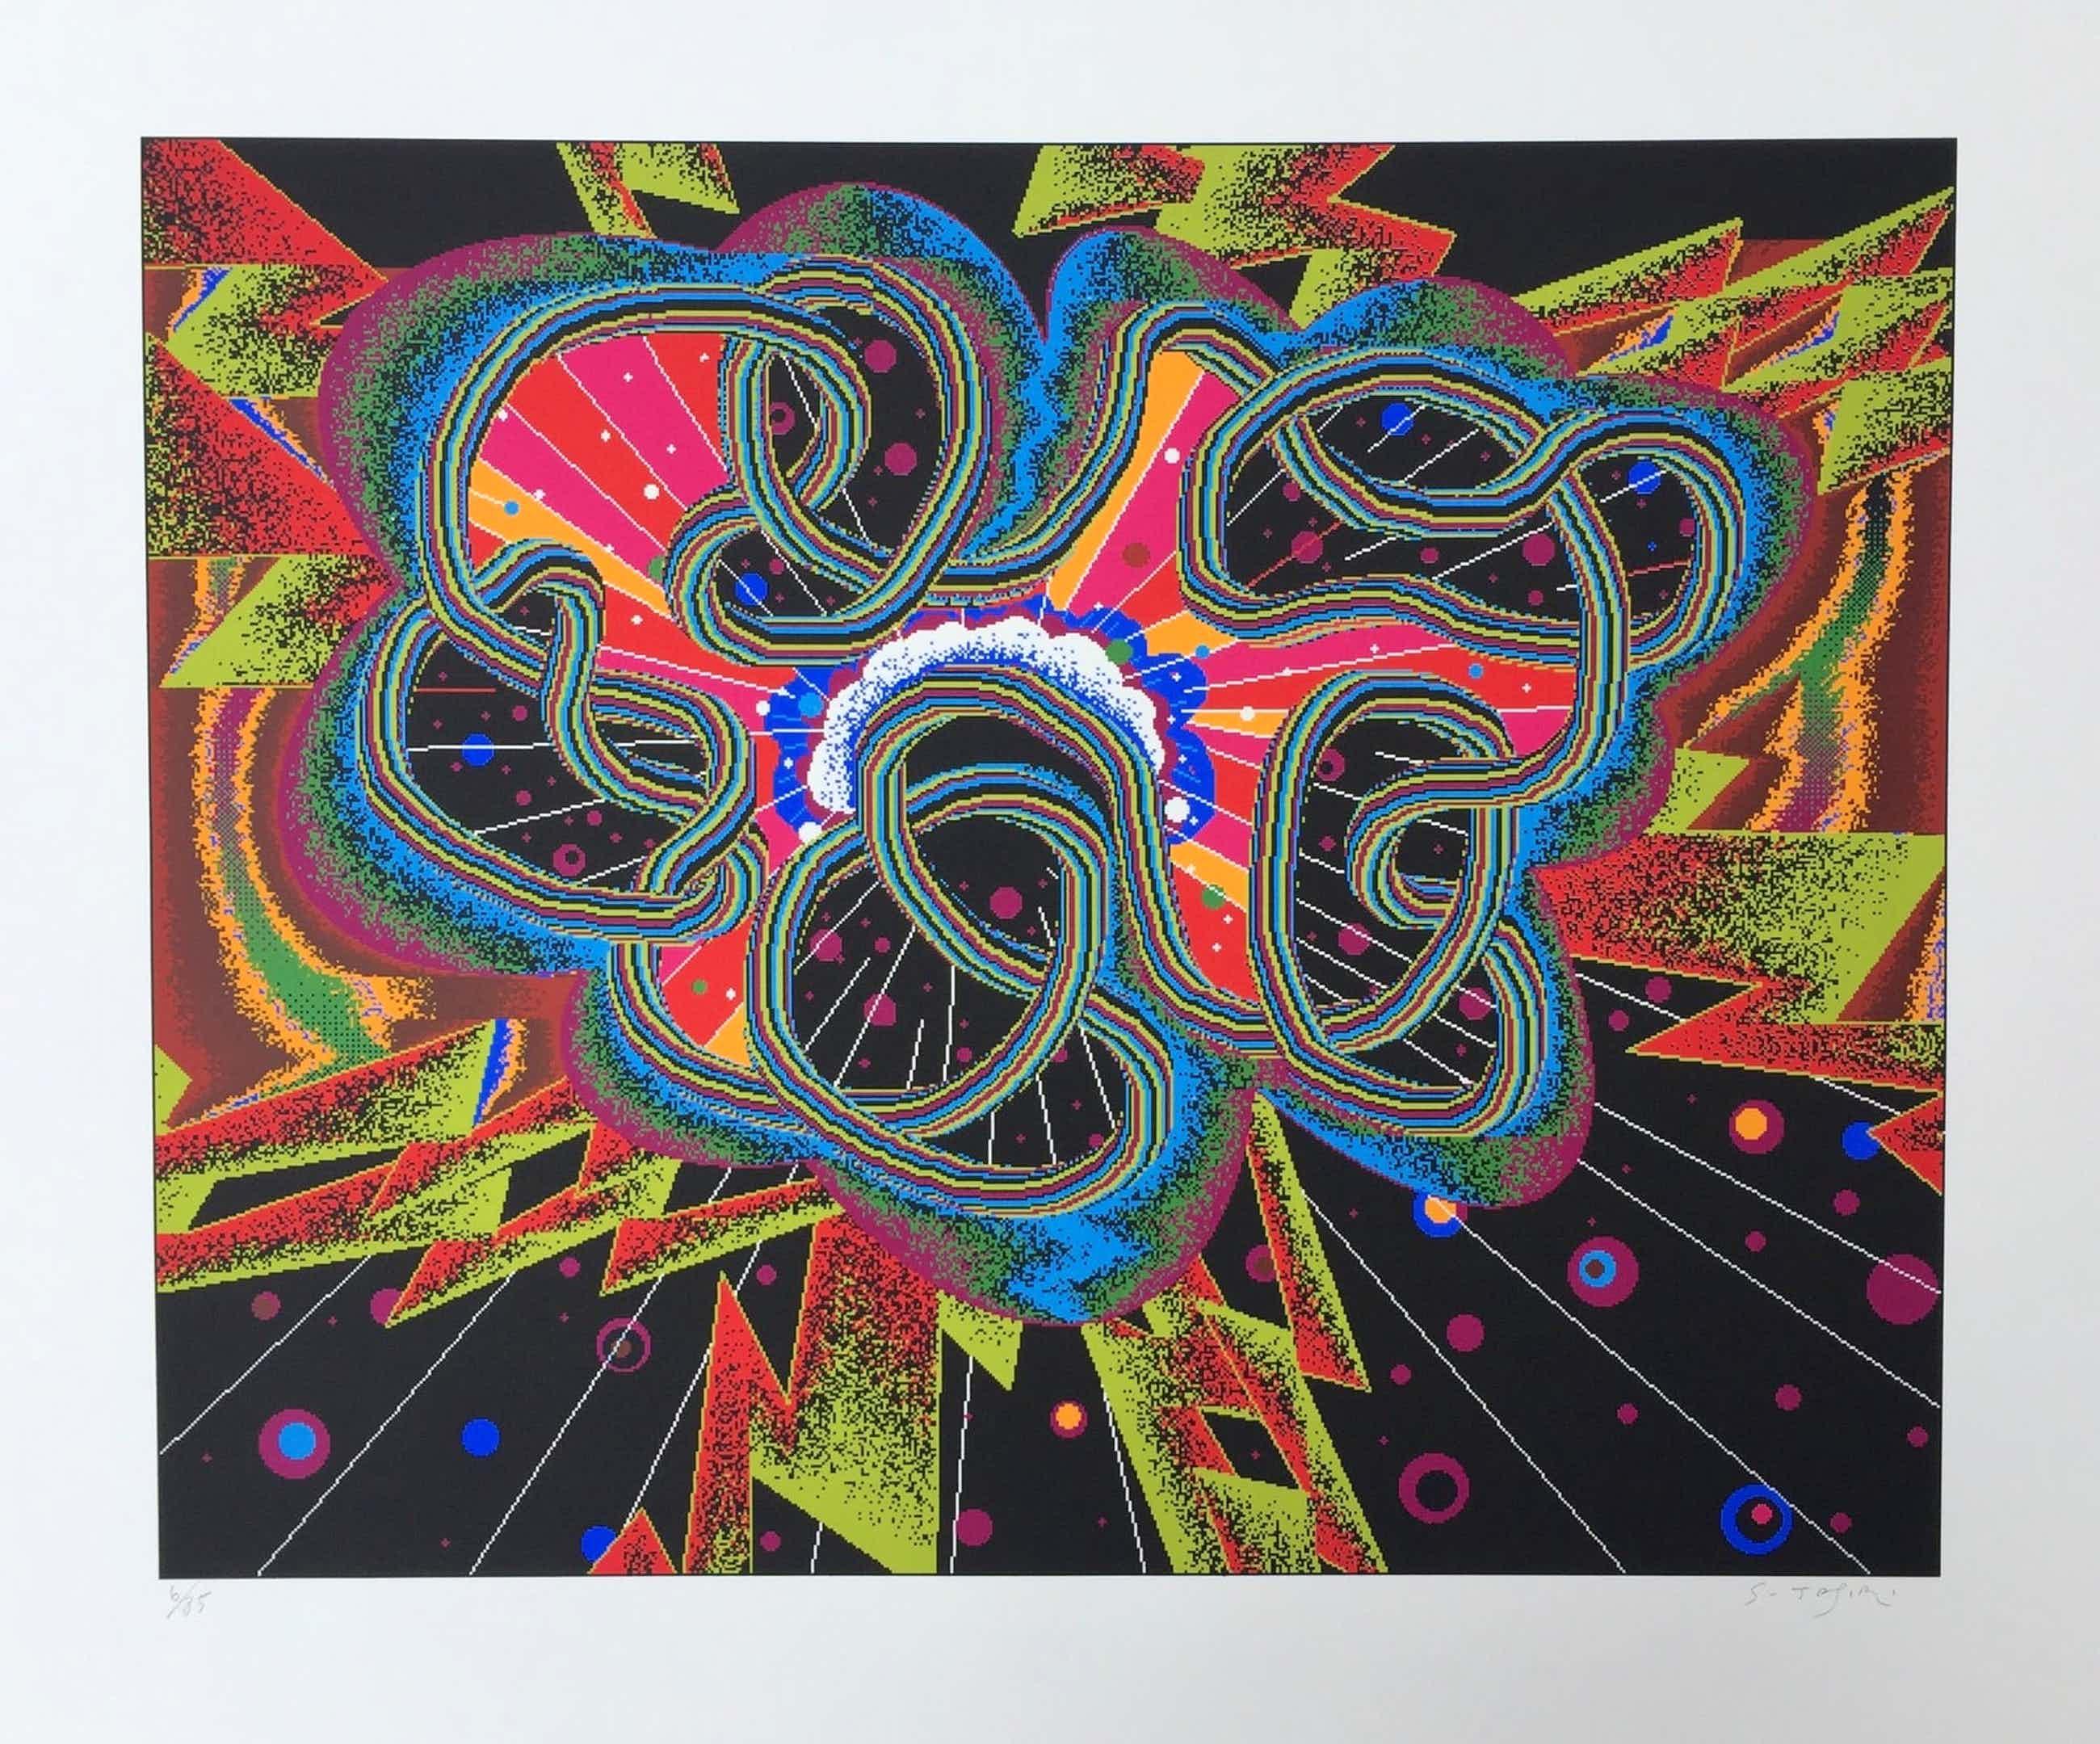 Shinkichi Tajiri - zeldzame knoop - gesigneerde zeefdruk 'Big Bang' - oplage 85 ex kopen? Bied vanaf 140!